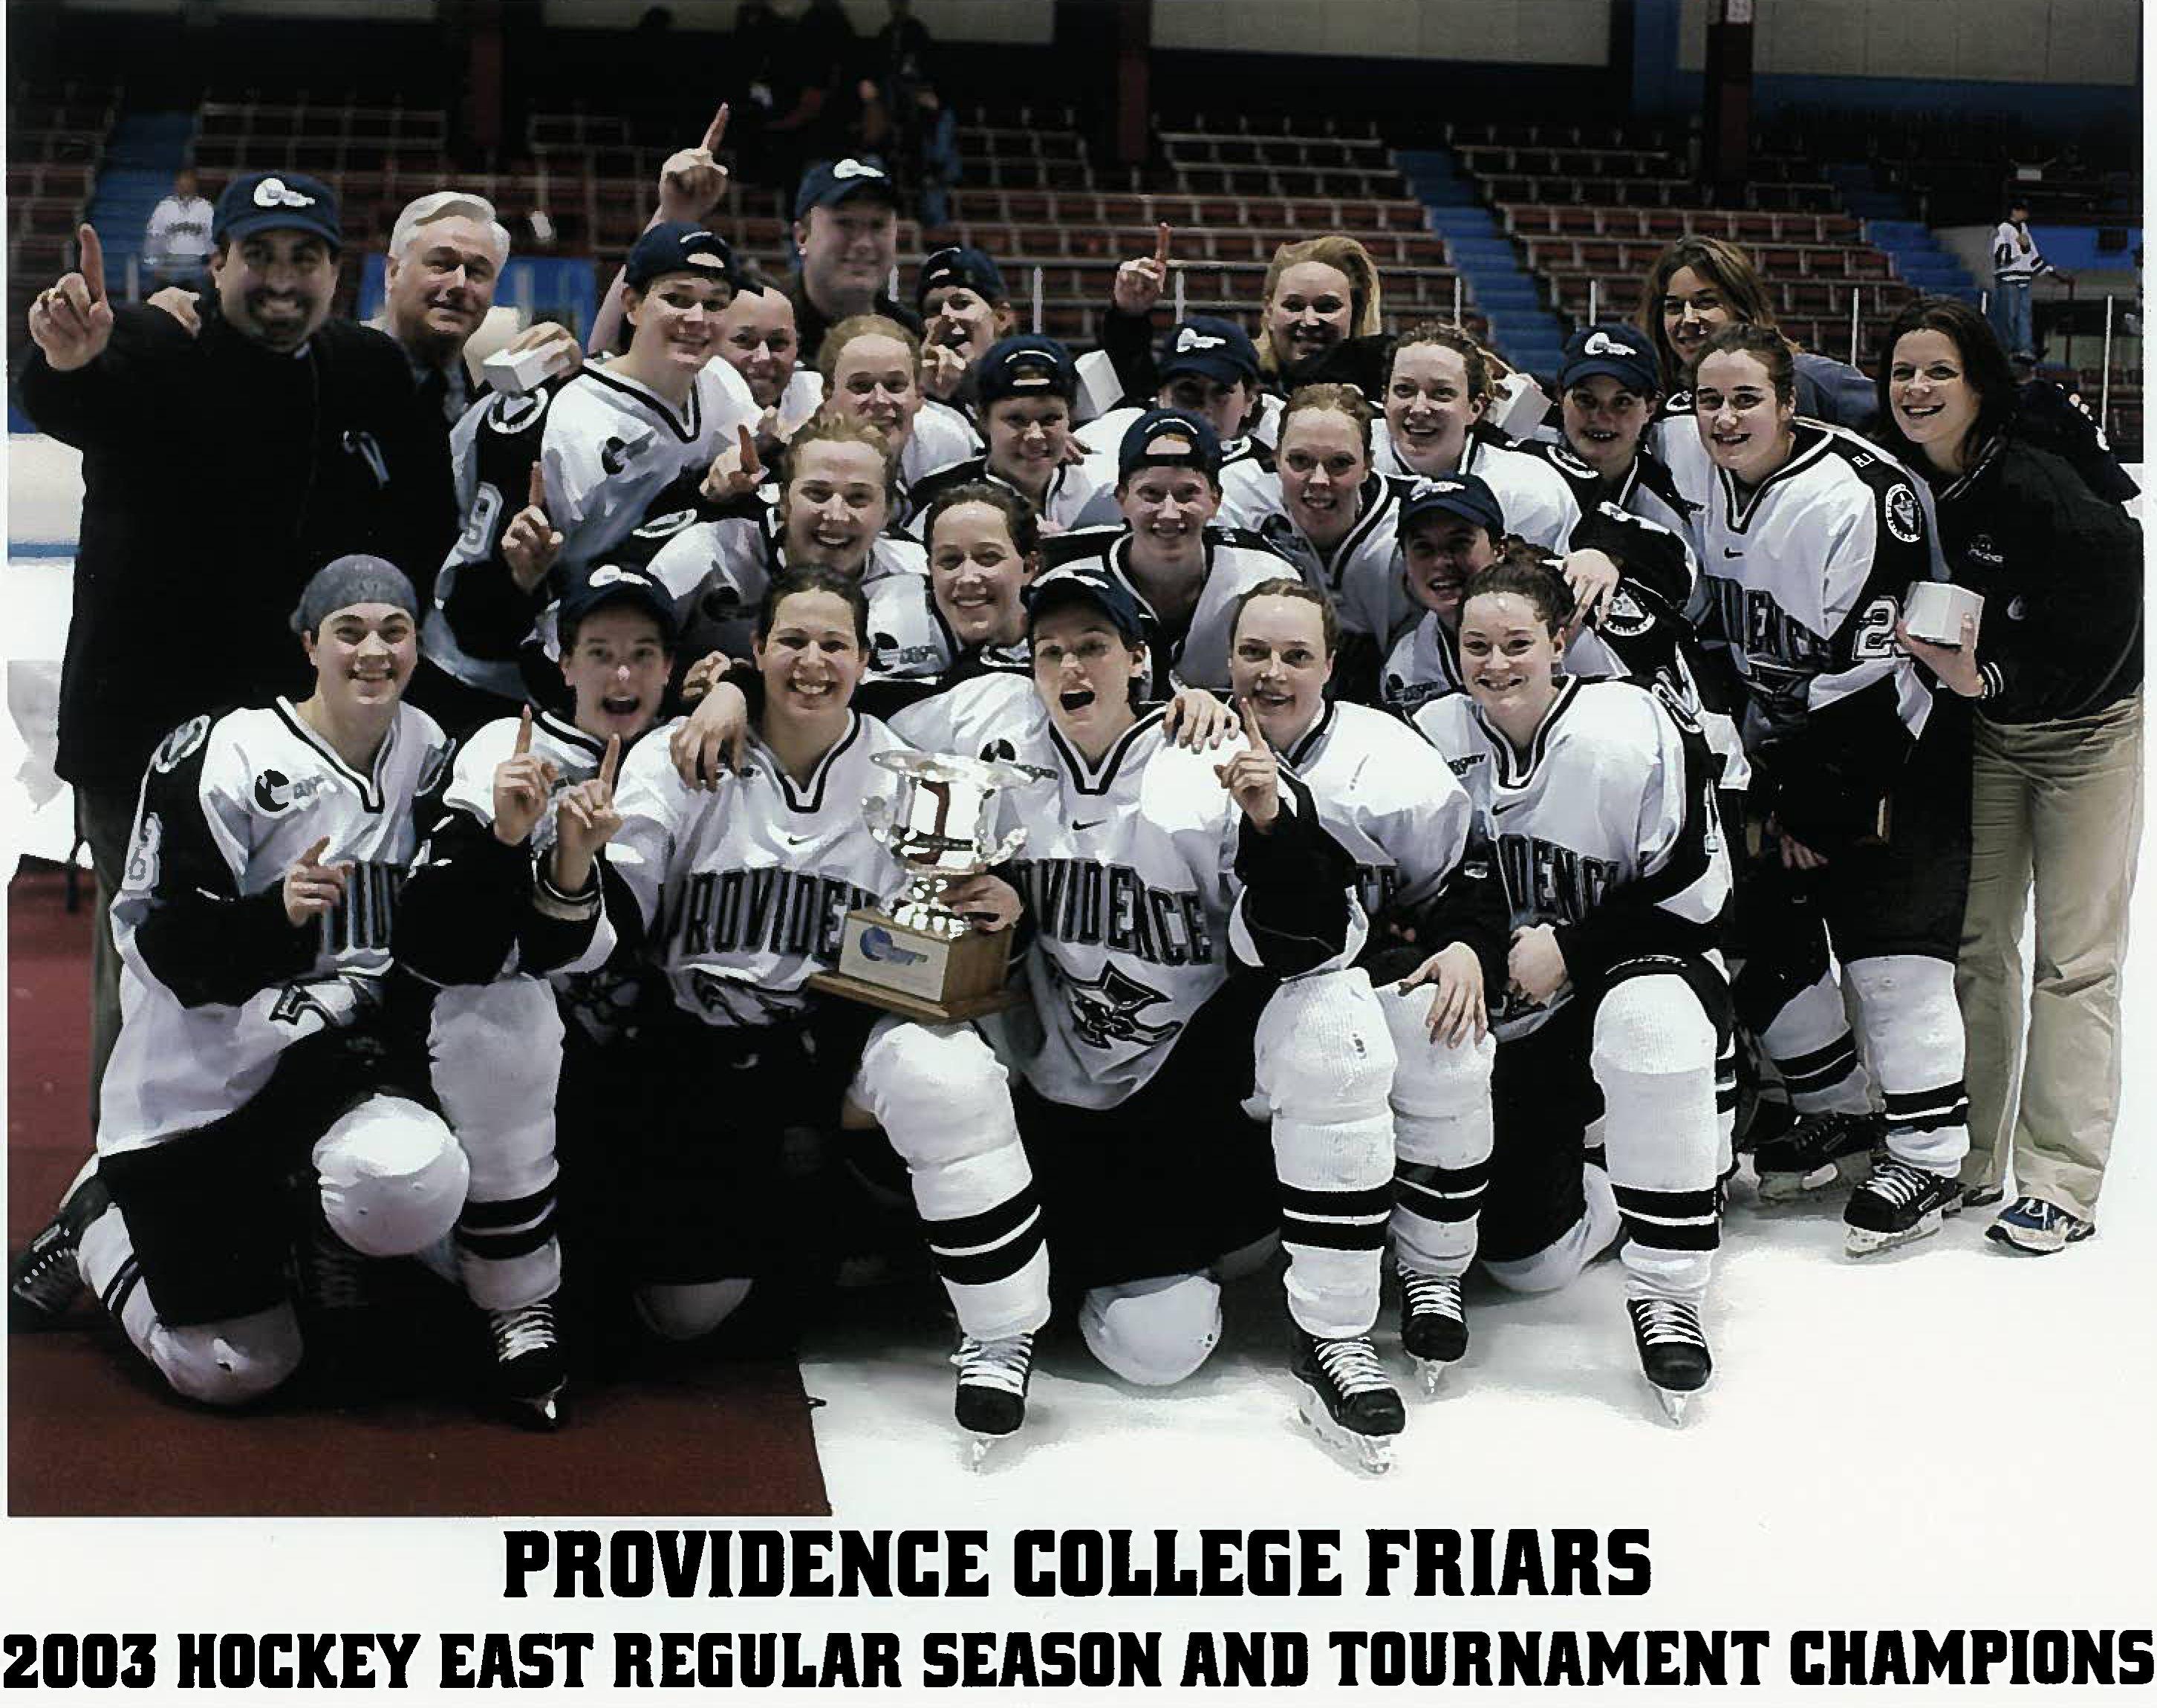 2003 Pc Women S Ice Hockey Team Becomes Hockey East Champs Ice Hockey Teams Hockey Teams Hockey